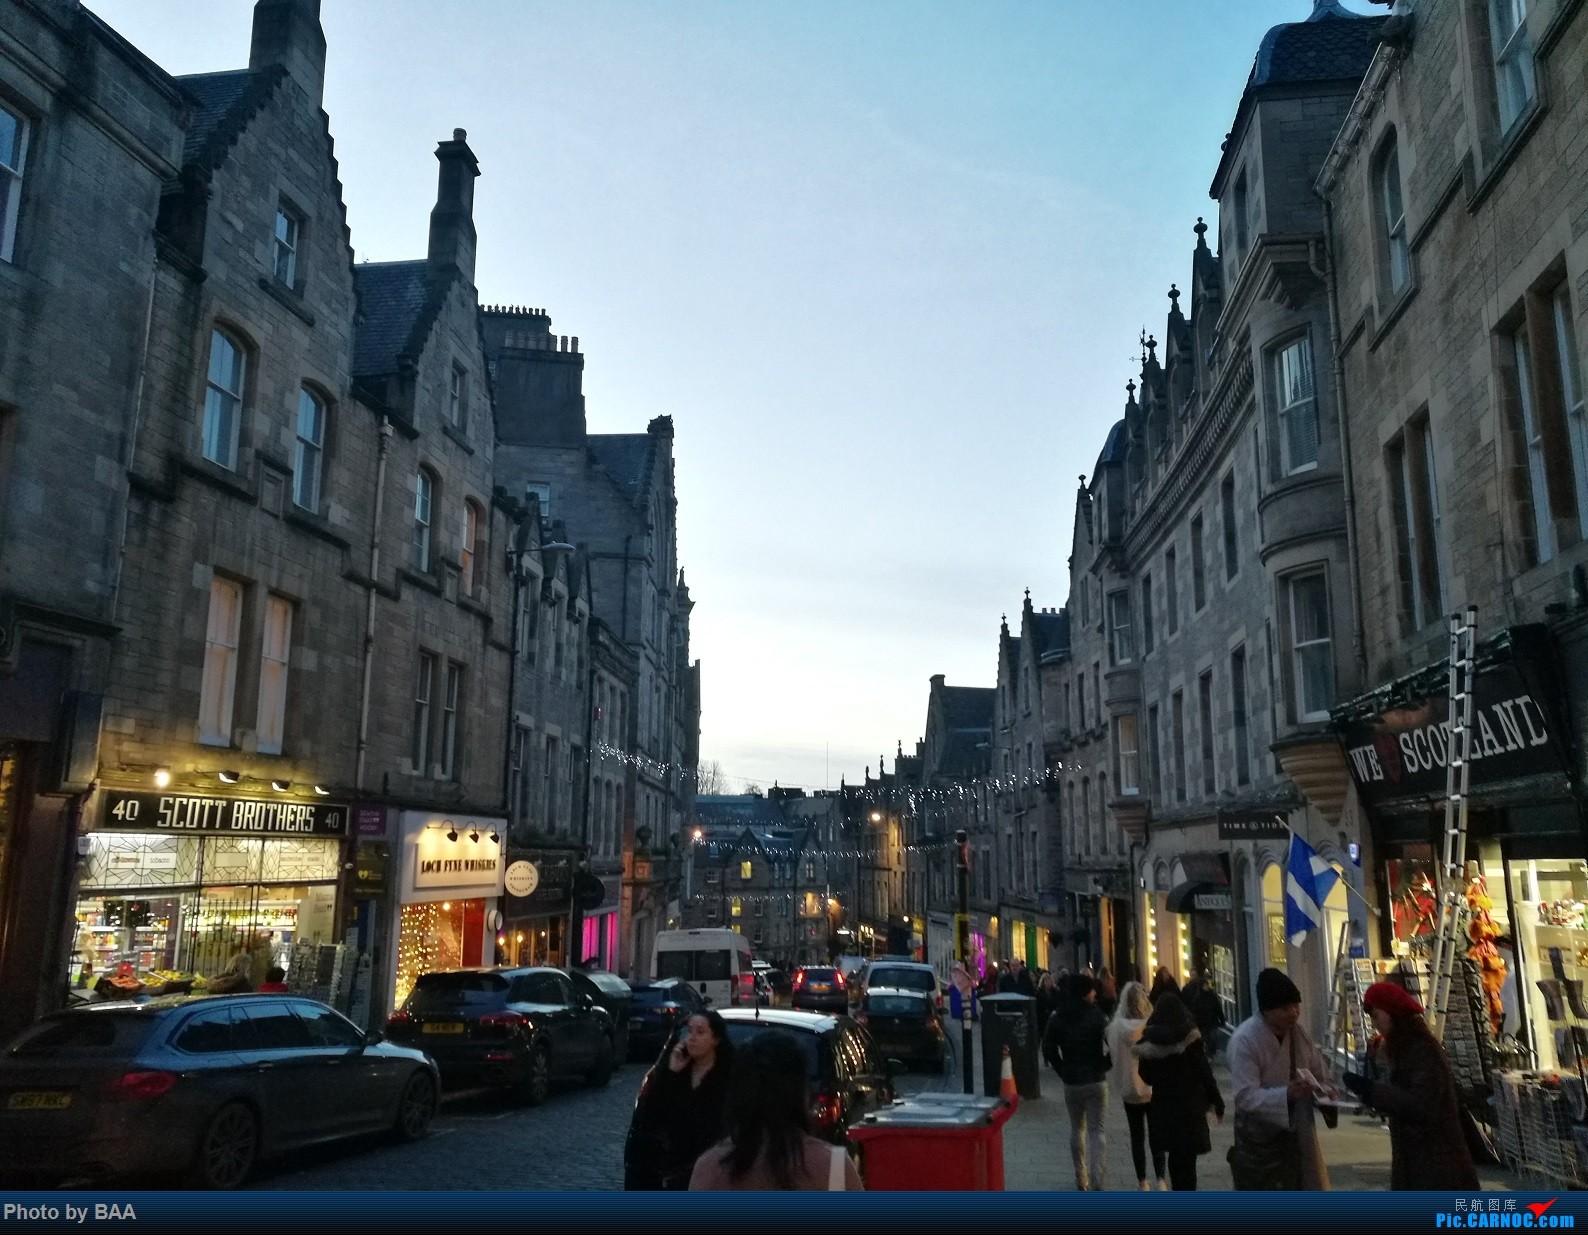 Re:[原创]《带你去旅行》之爱丁堡之旅